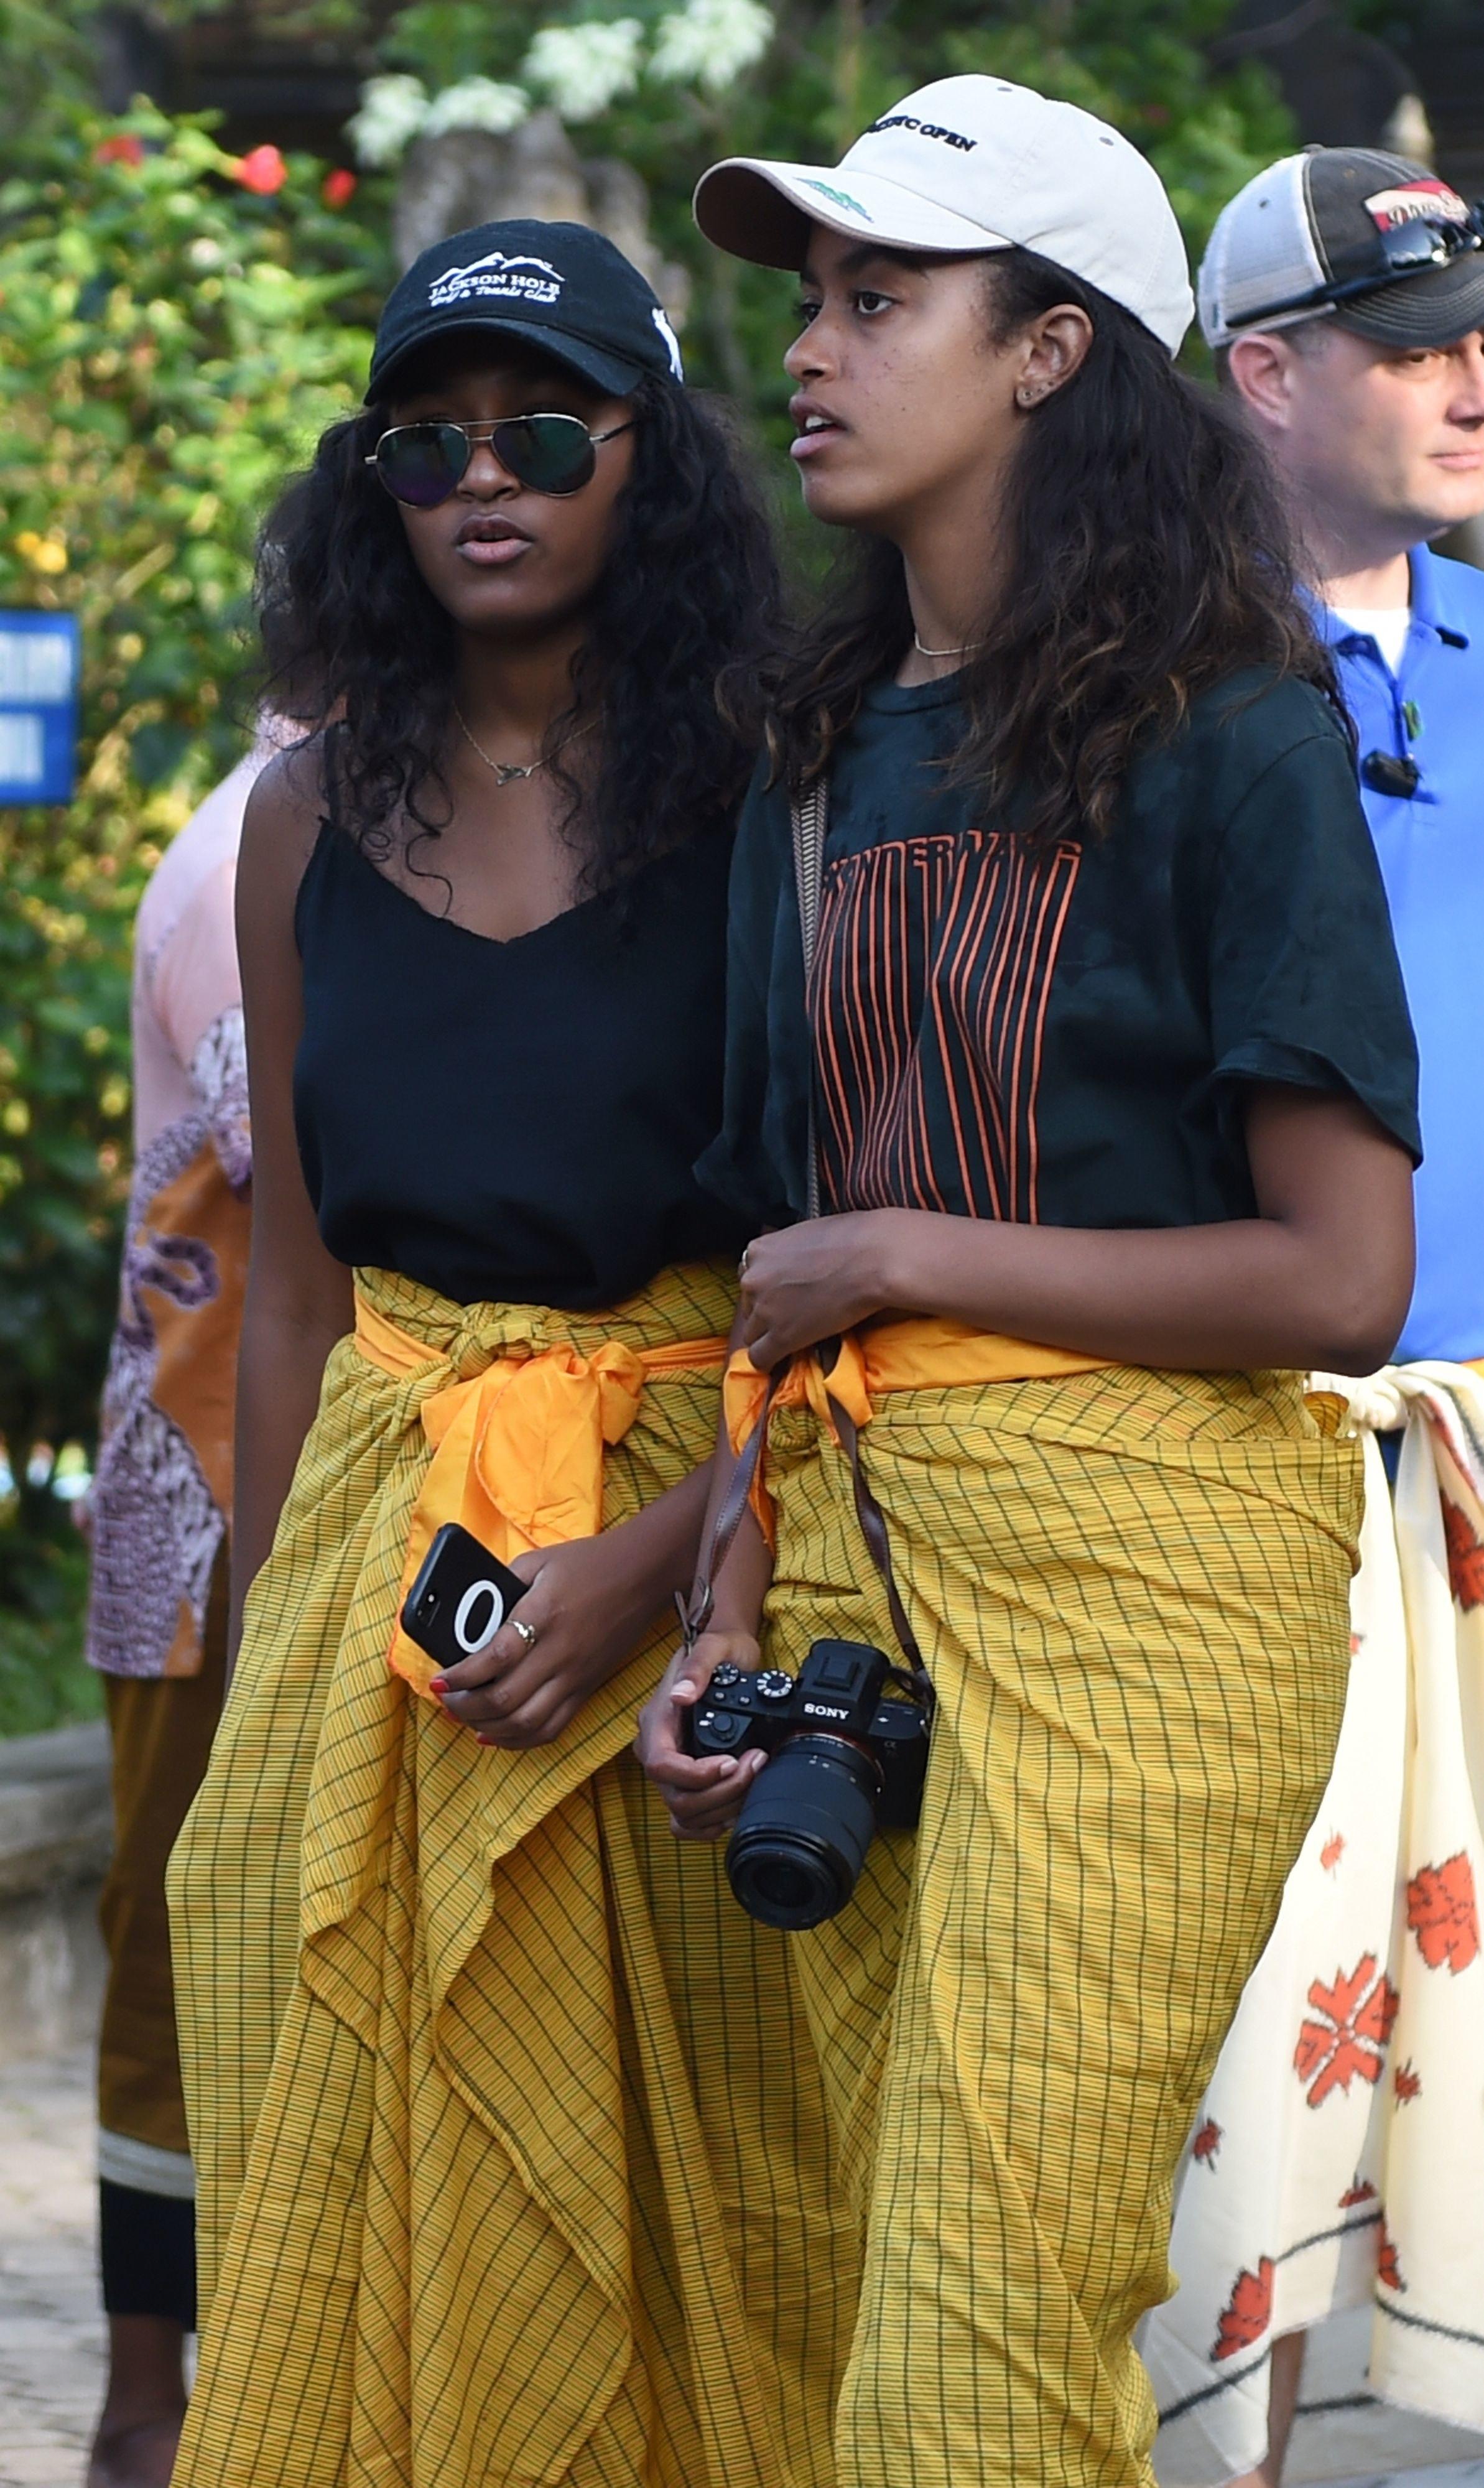 Sasha (L) and Malia (R), daughters of former US president Barack Obama, visit Tirtha Empul temple at Tampaksiring Village in Gianyar on the Indonesian resort island of Bali on June 27, 2017